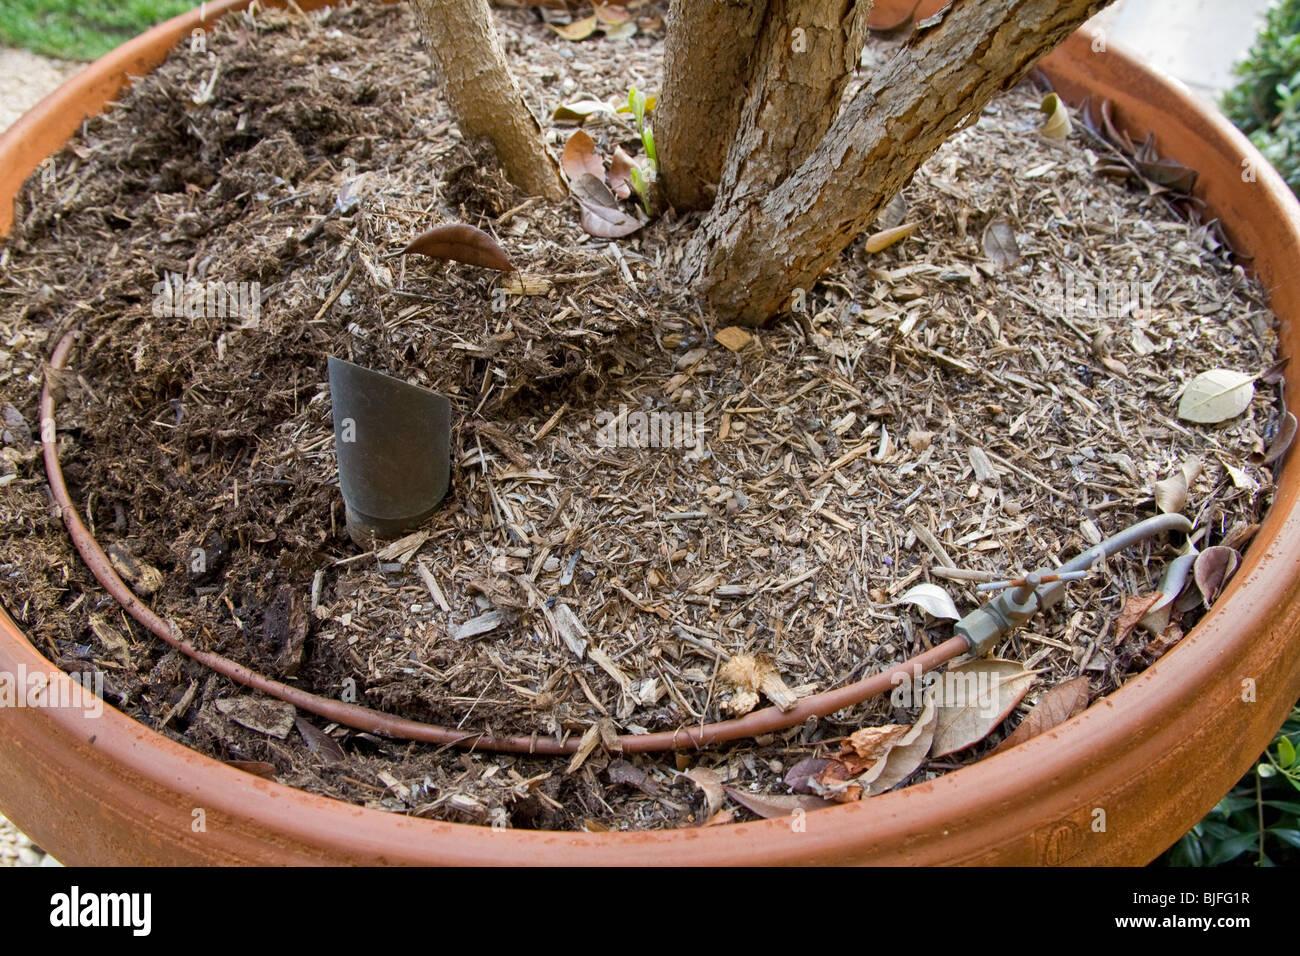 Irrigazione A Goccia Per Vasi Di Feijoa Tree Foto Immagine